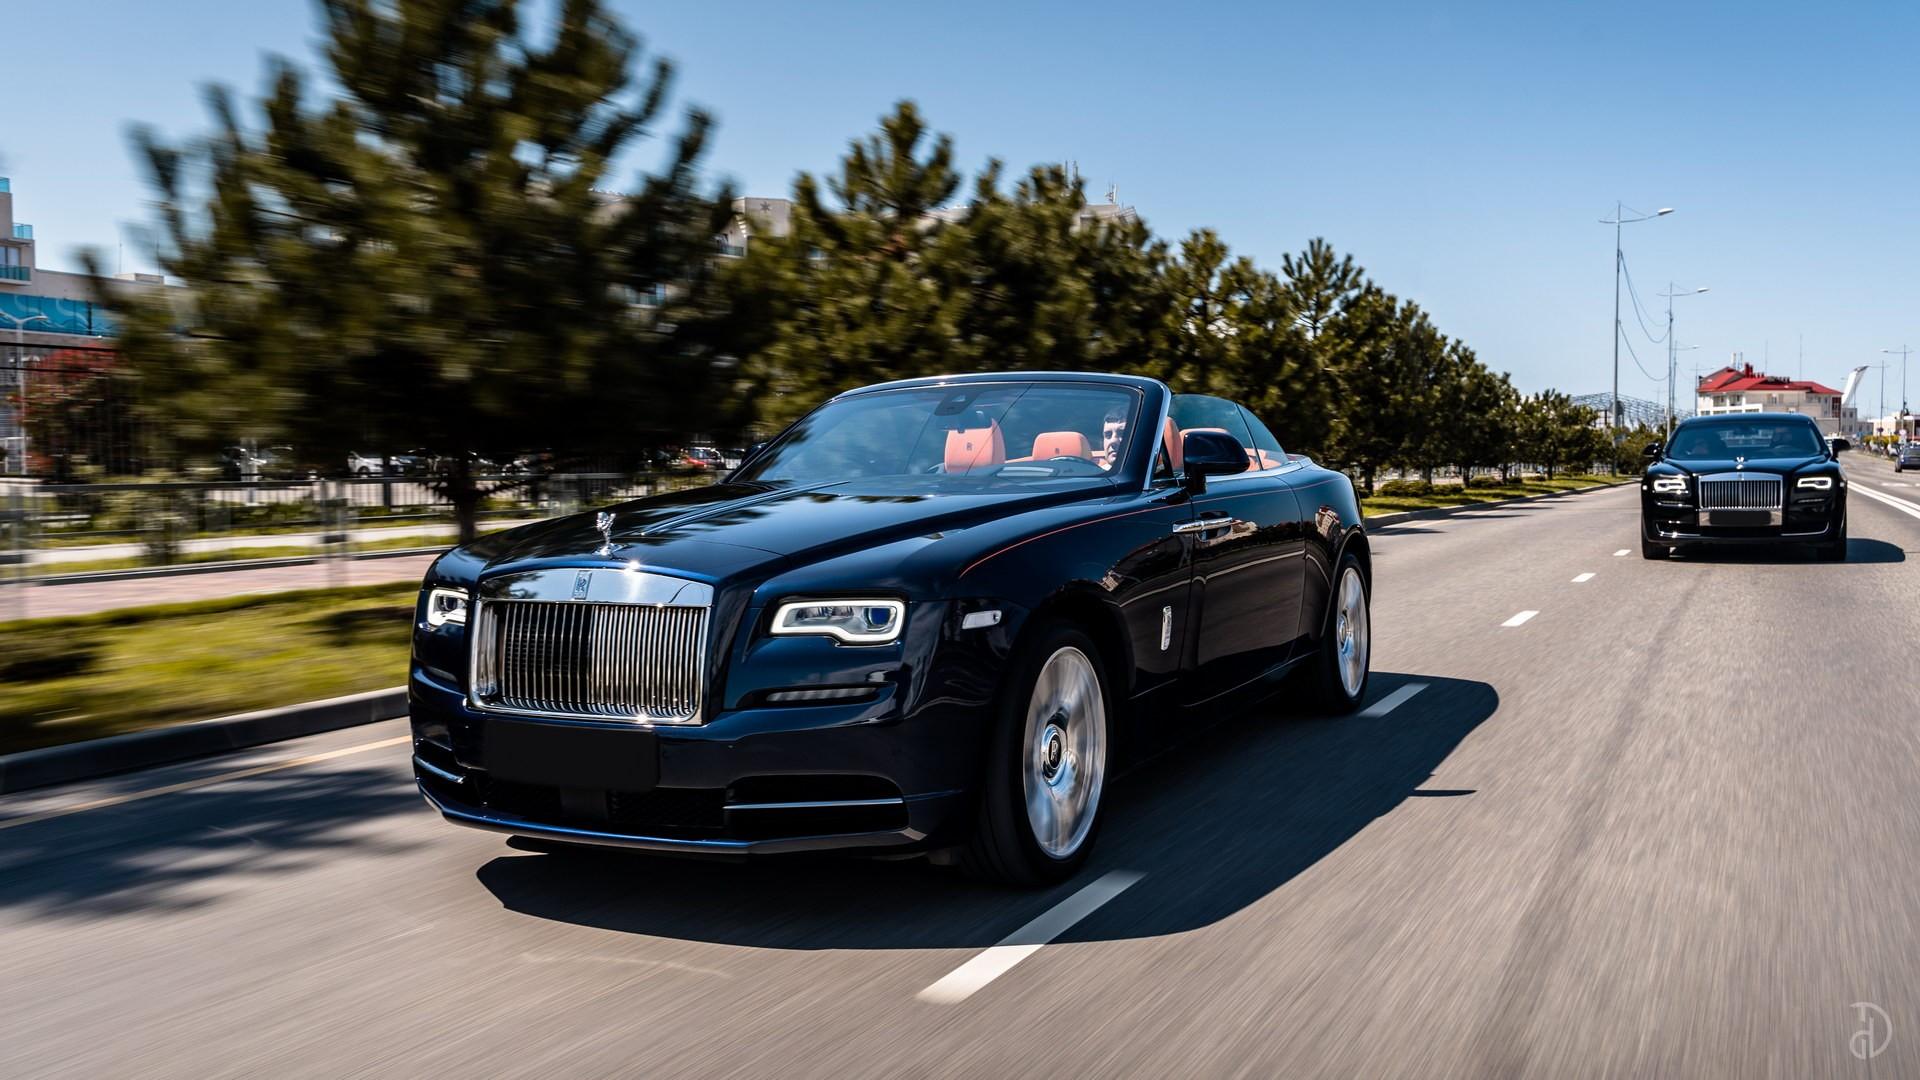 Аренда Rolls-Royce Dawn в Сочи. Фото 17